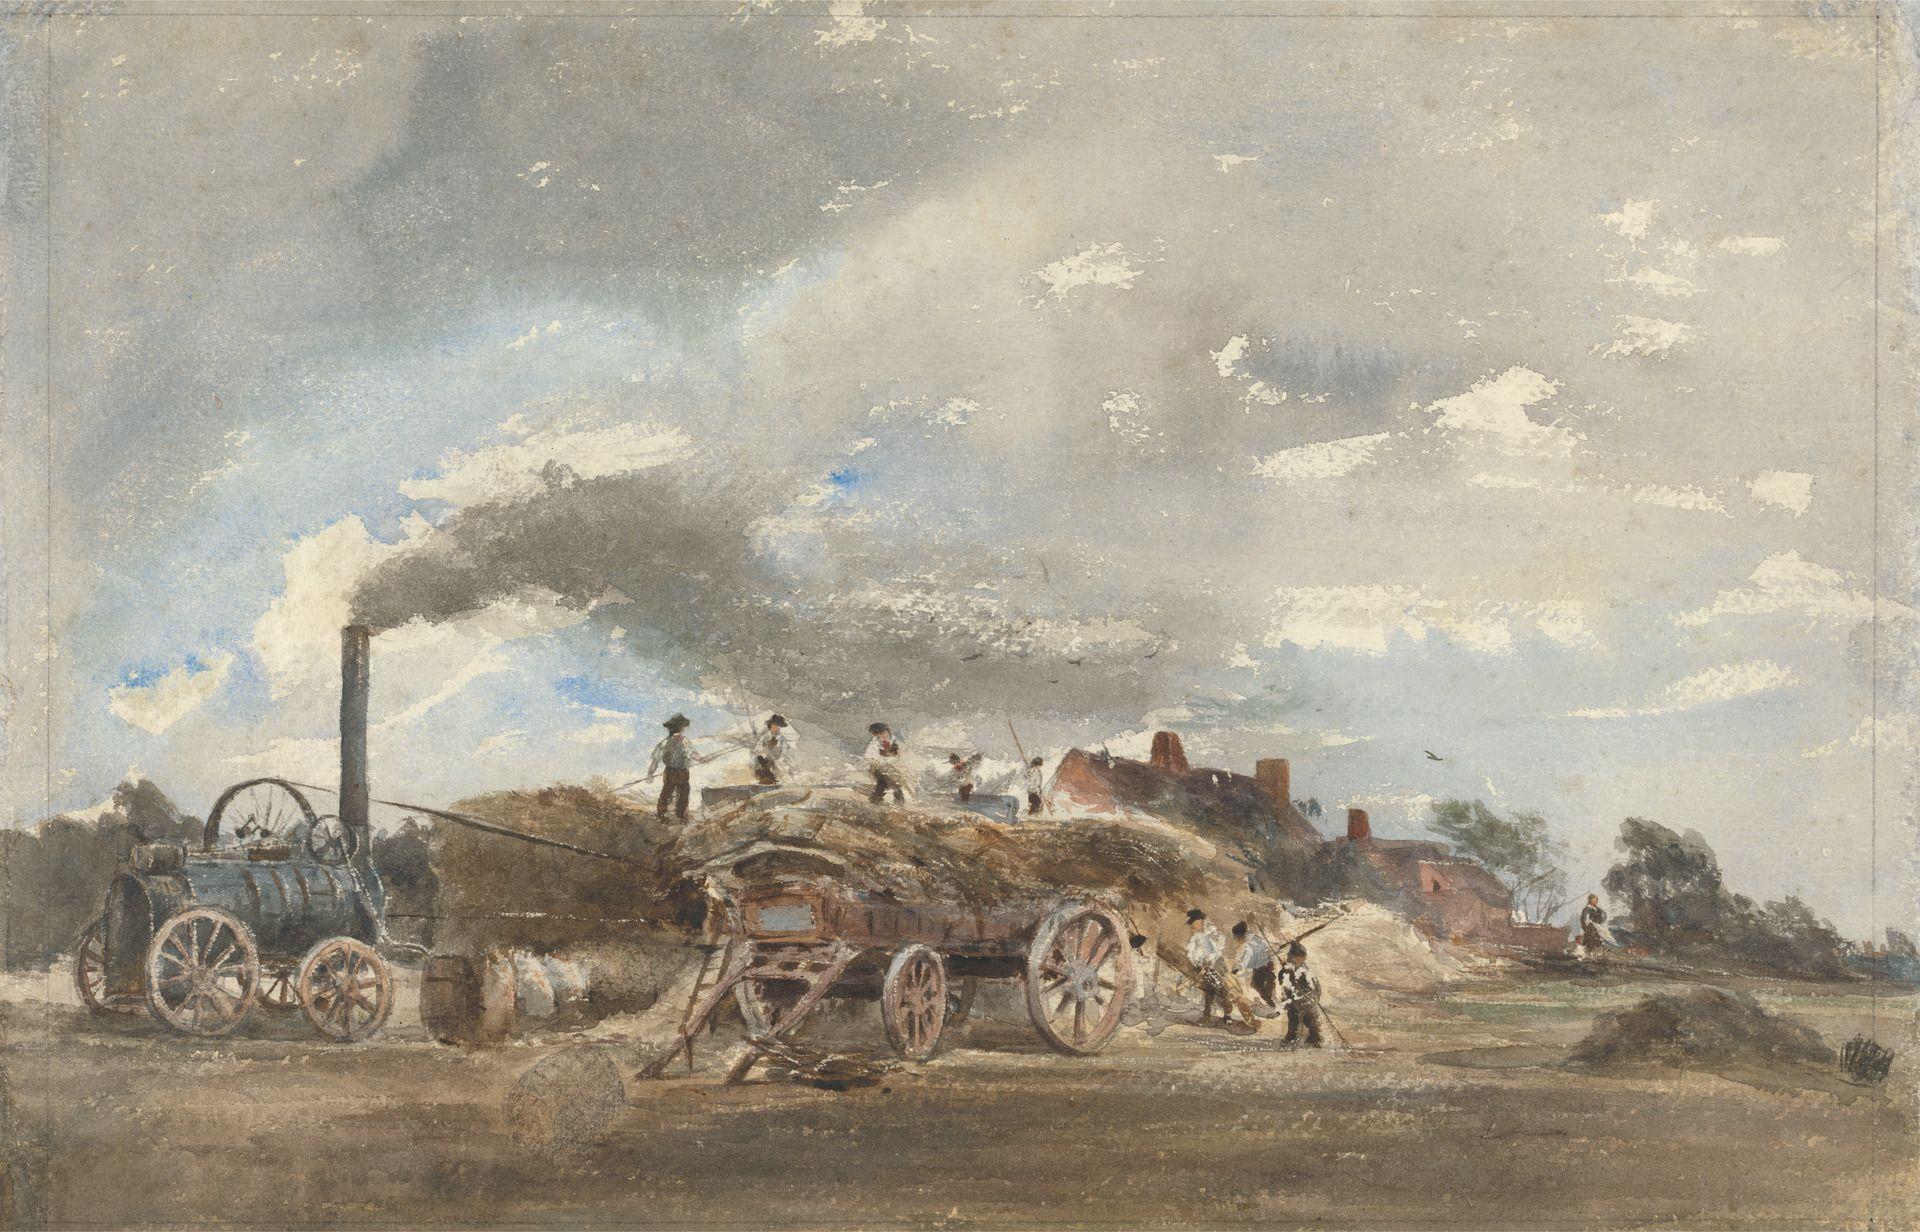 Threshing Corn | Peter de Wint | Oil Painting